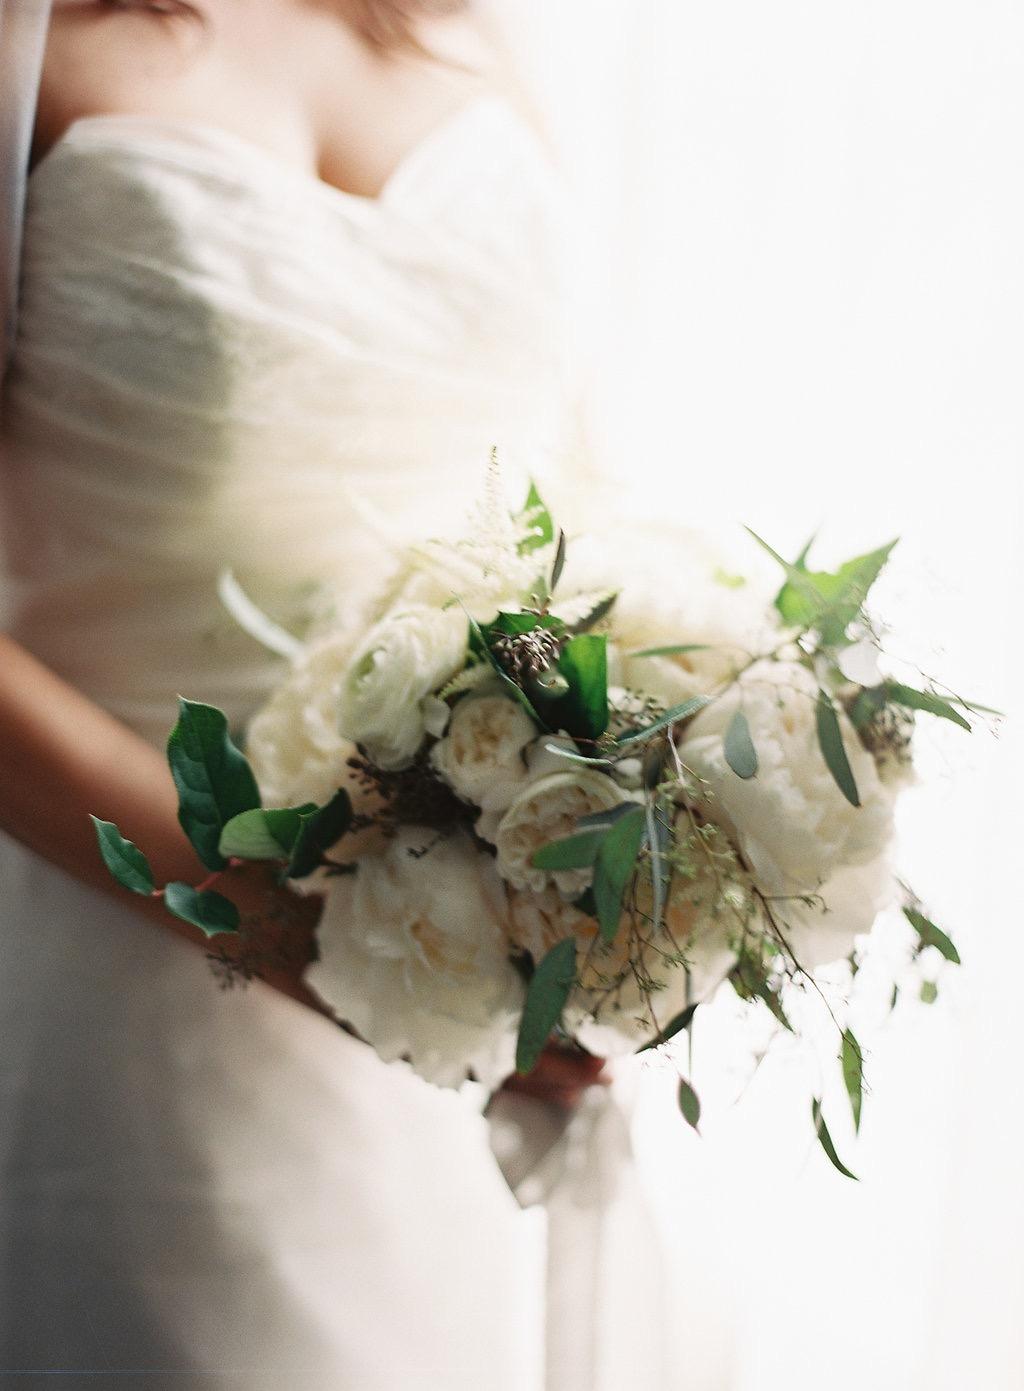 amelia_johnson_photography_gane-gibson_wedding4.jpg